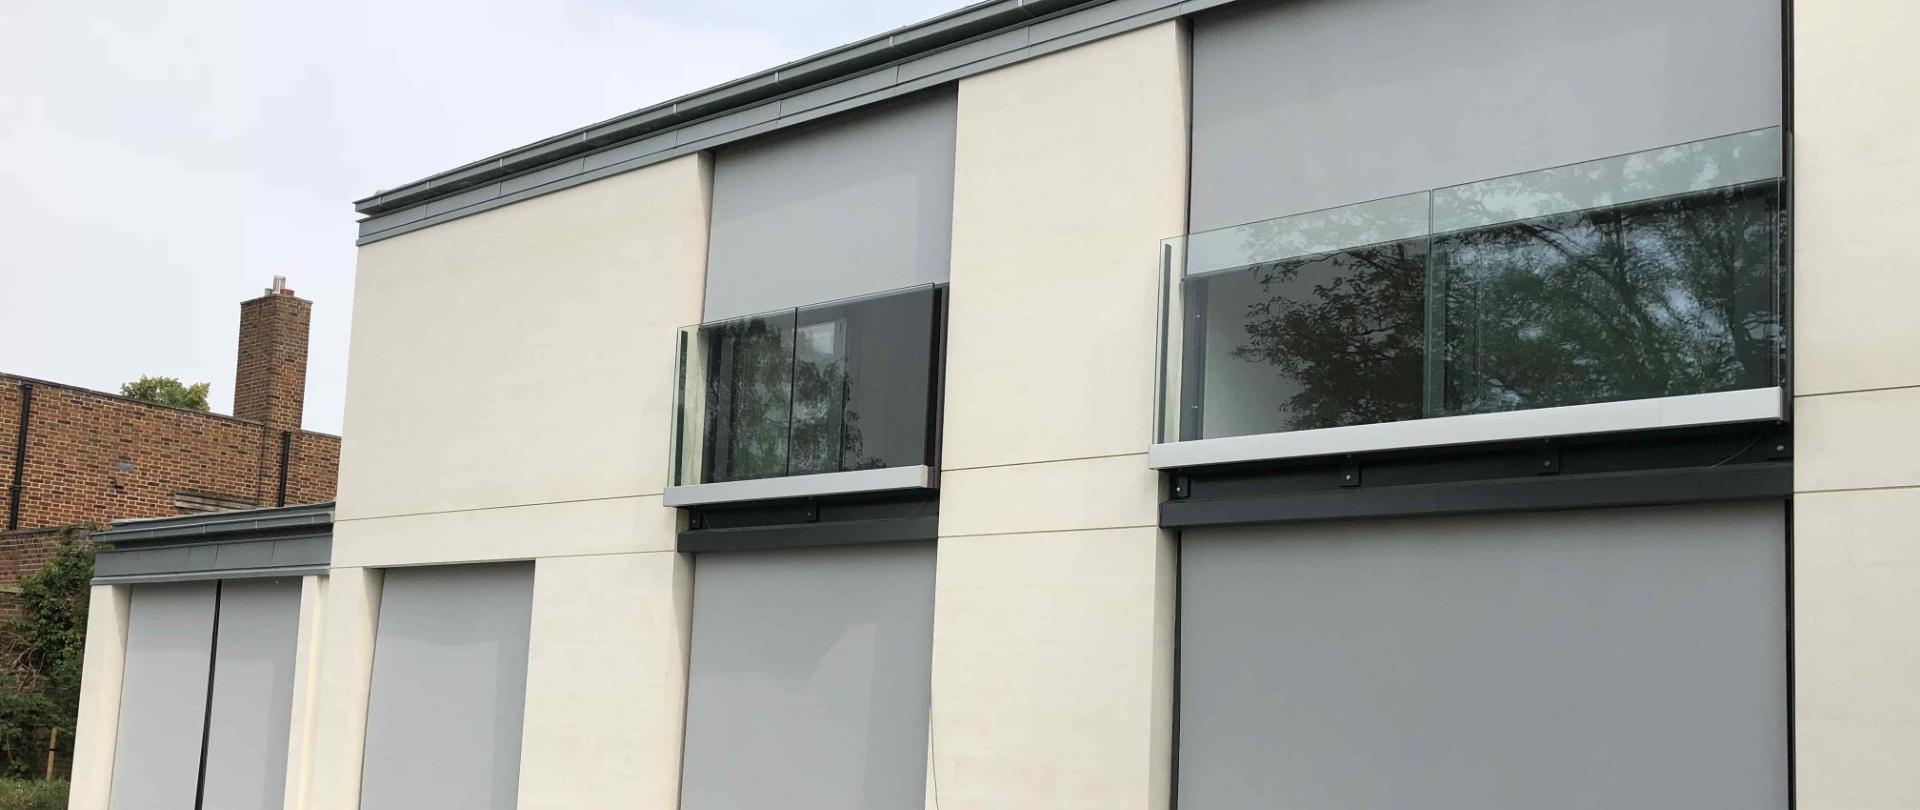 Warema UK screen fabric external roller blinds Cambridge